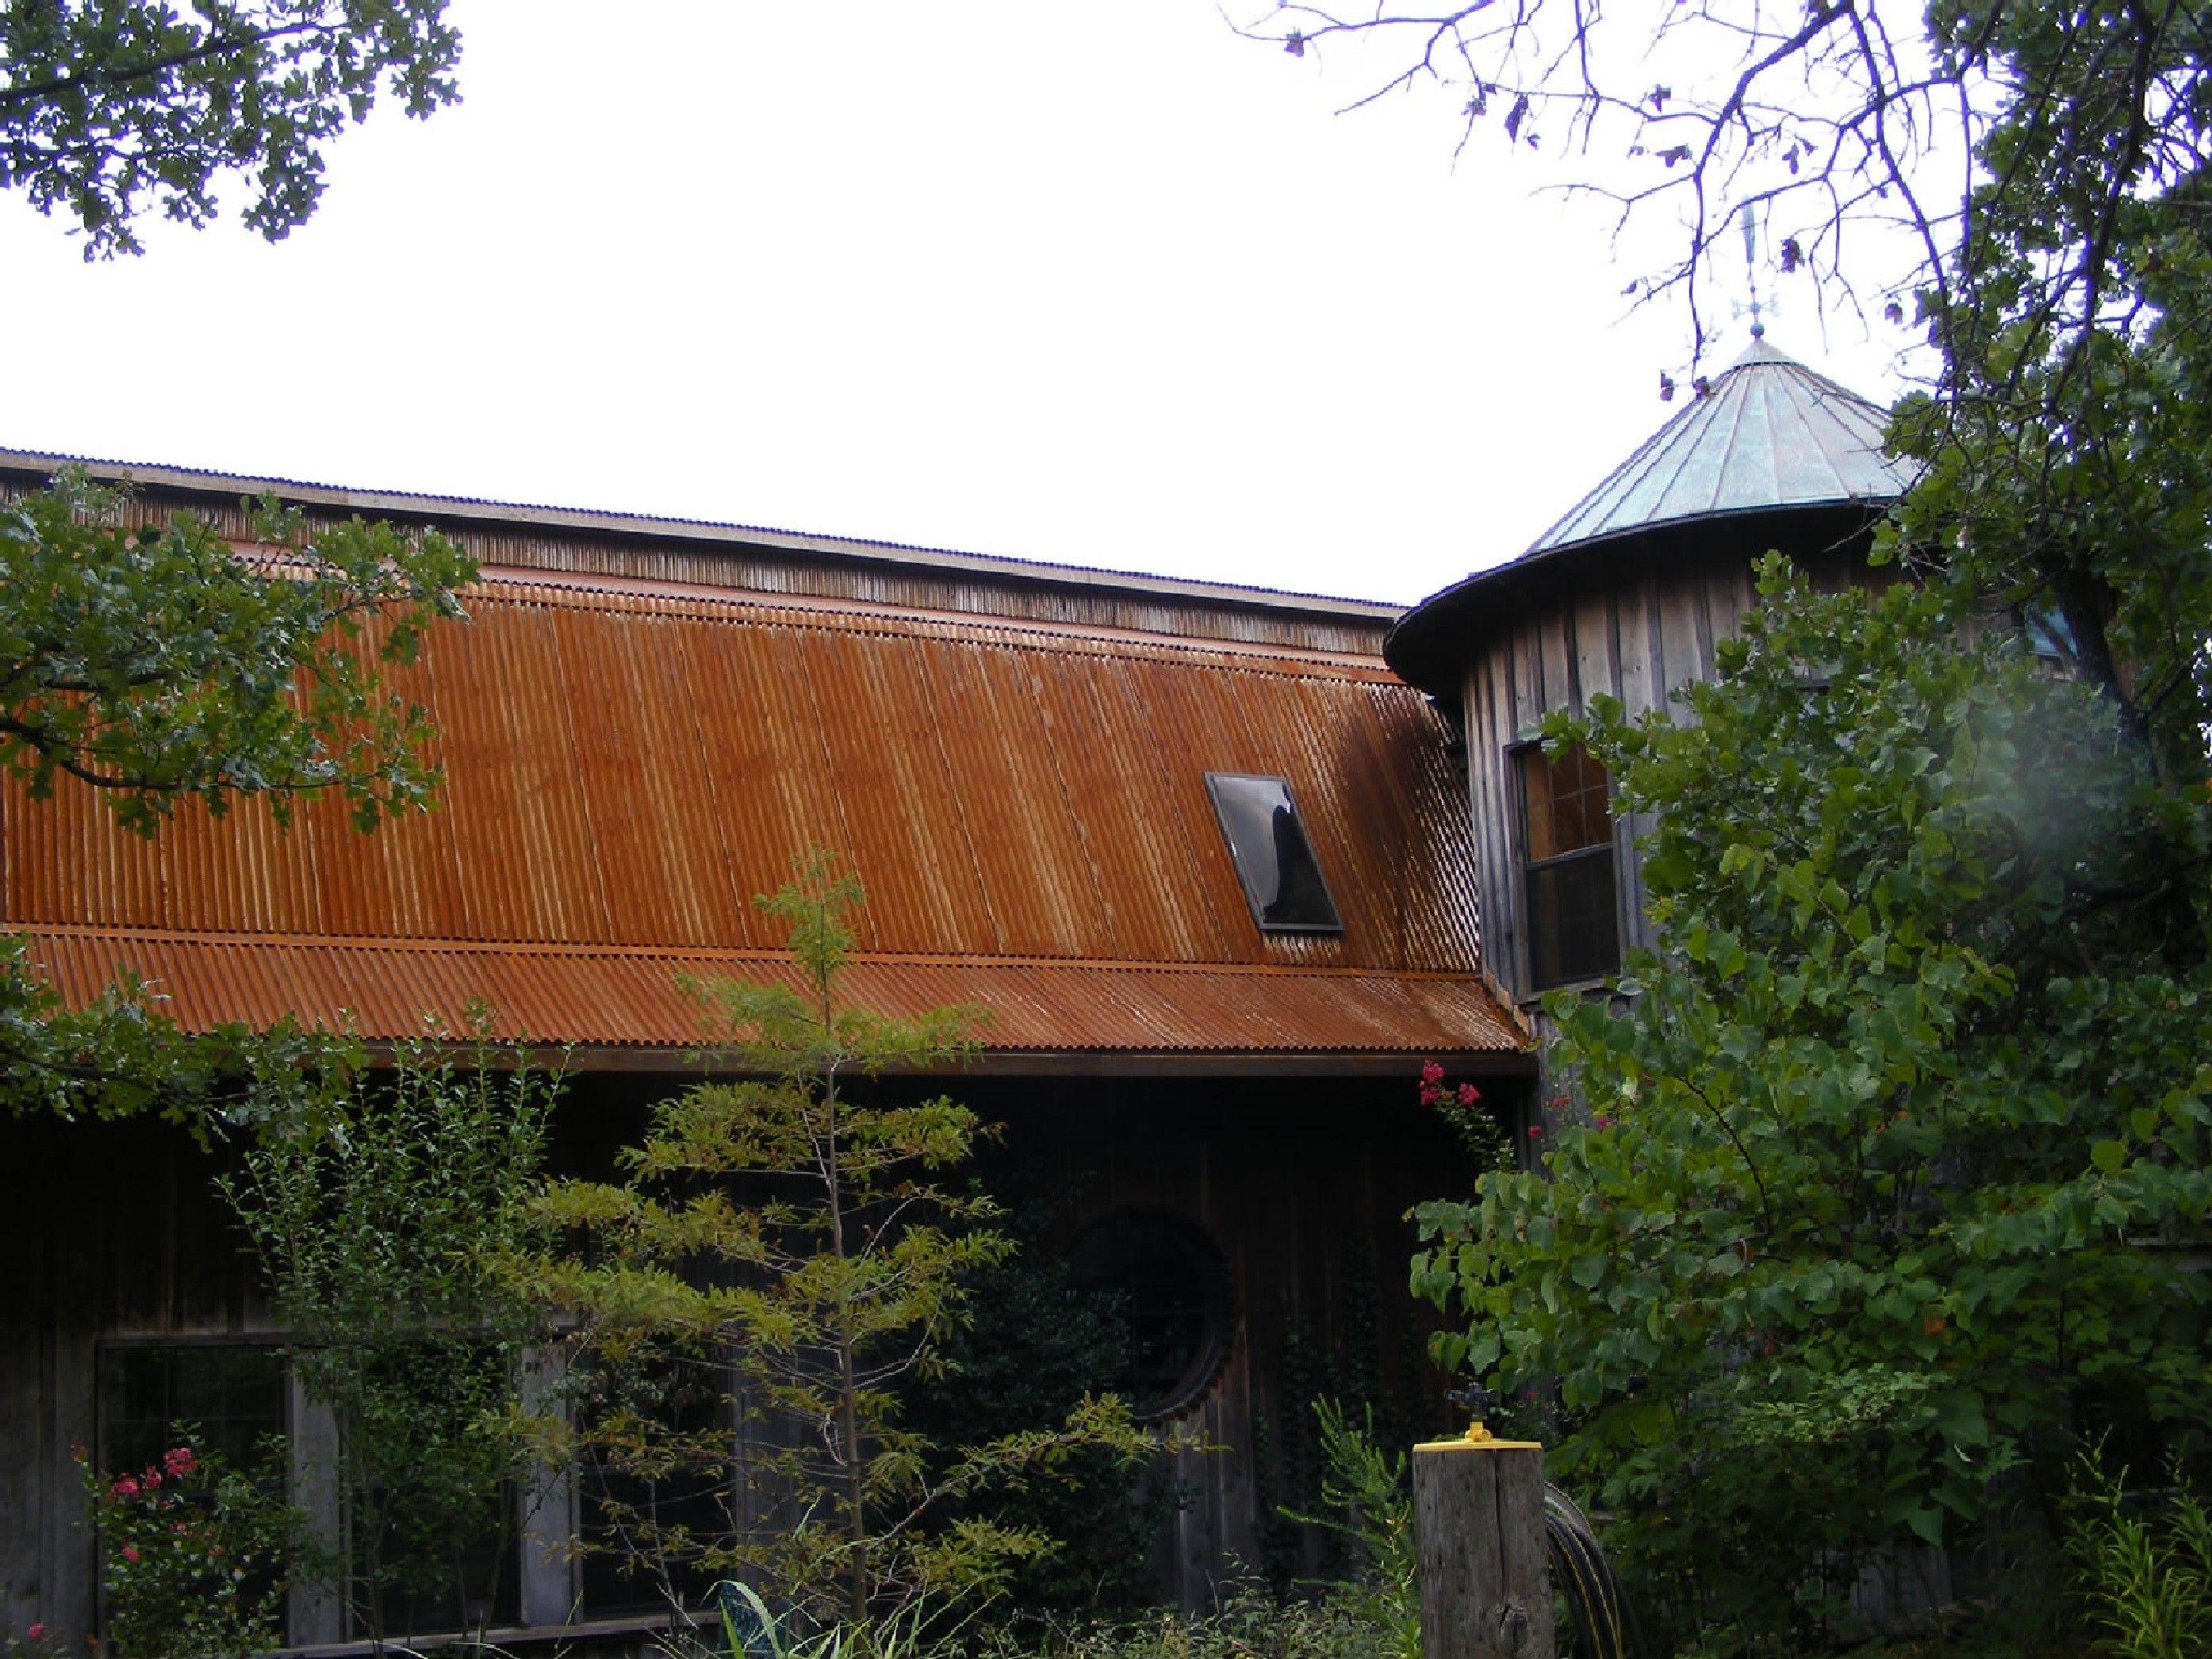 Best Rustic Corrugated Metal Roof Jpg 2789×2092 Corrugated 400 x 300